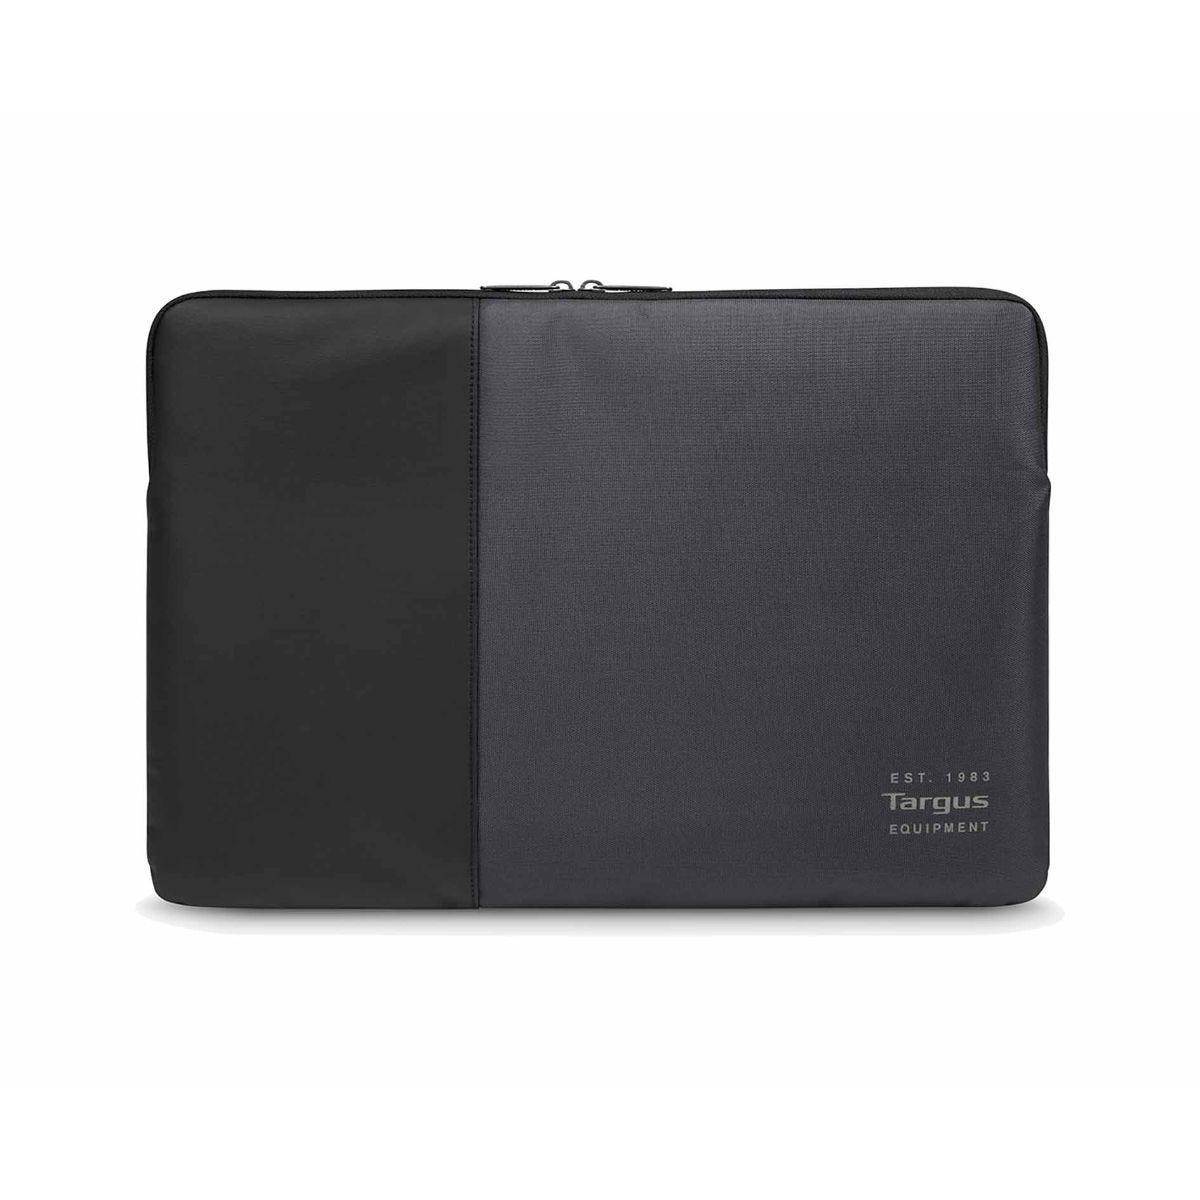 Image of Targus Pulse Laptop Sleeve 11.6-13.3 Inch, Black